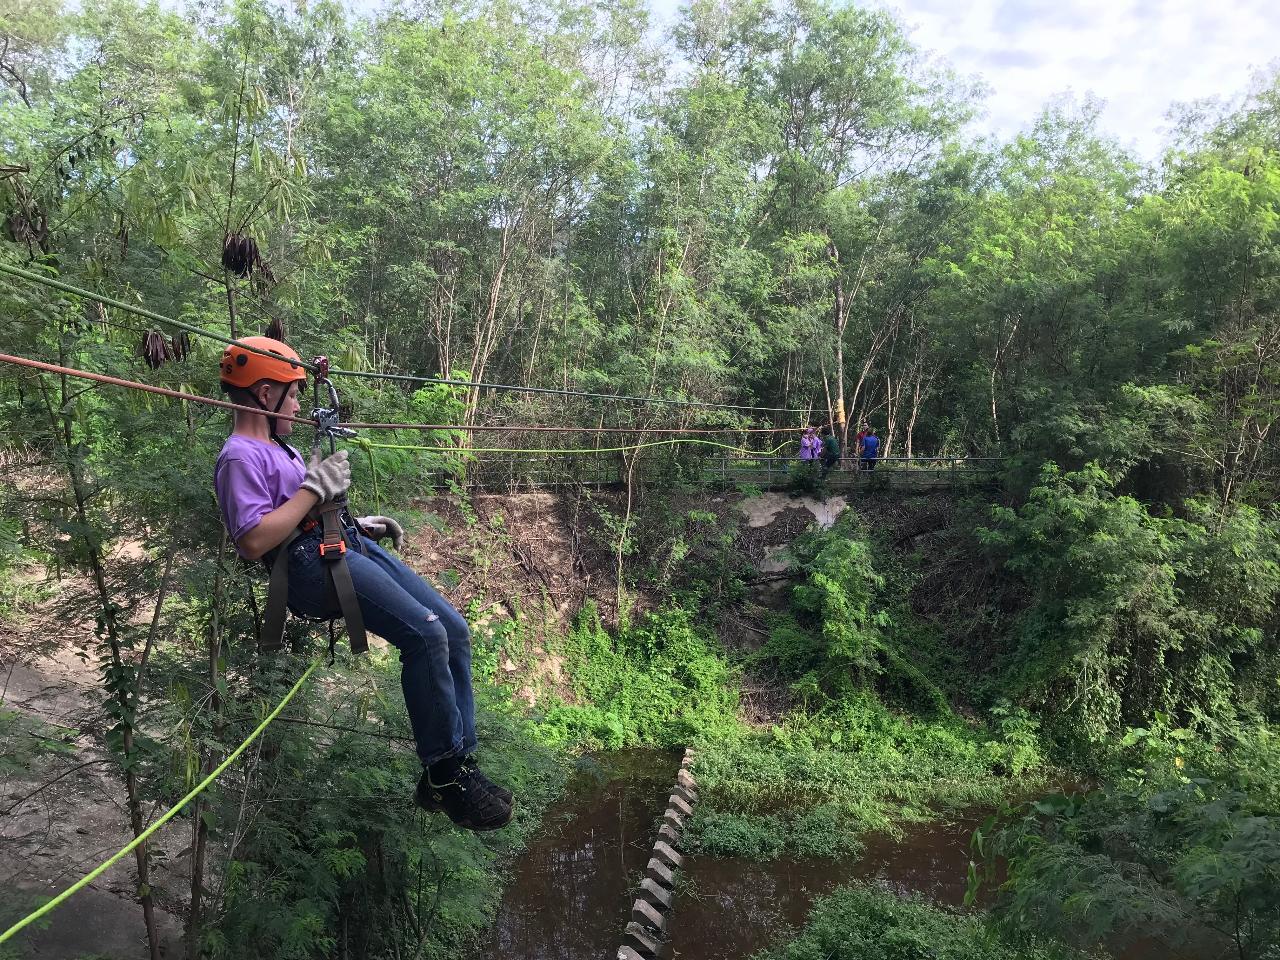 CMRCA Adventure Camp Day 3: Rope Bridge Challenge